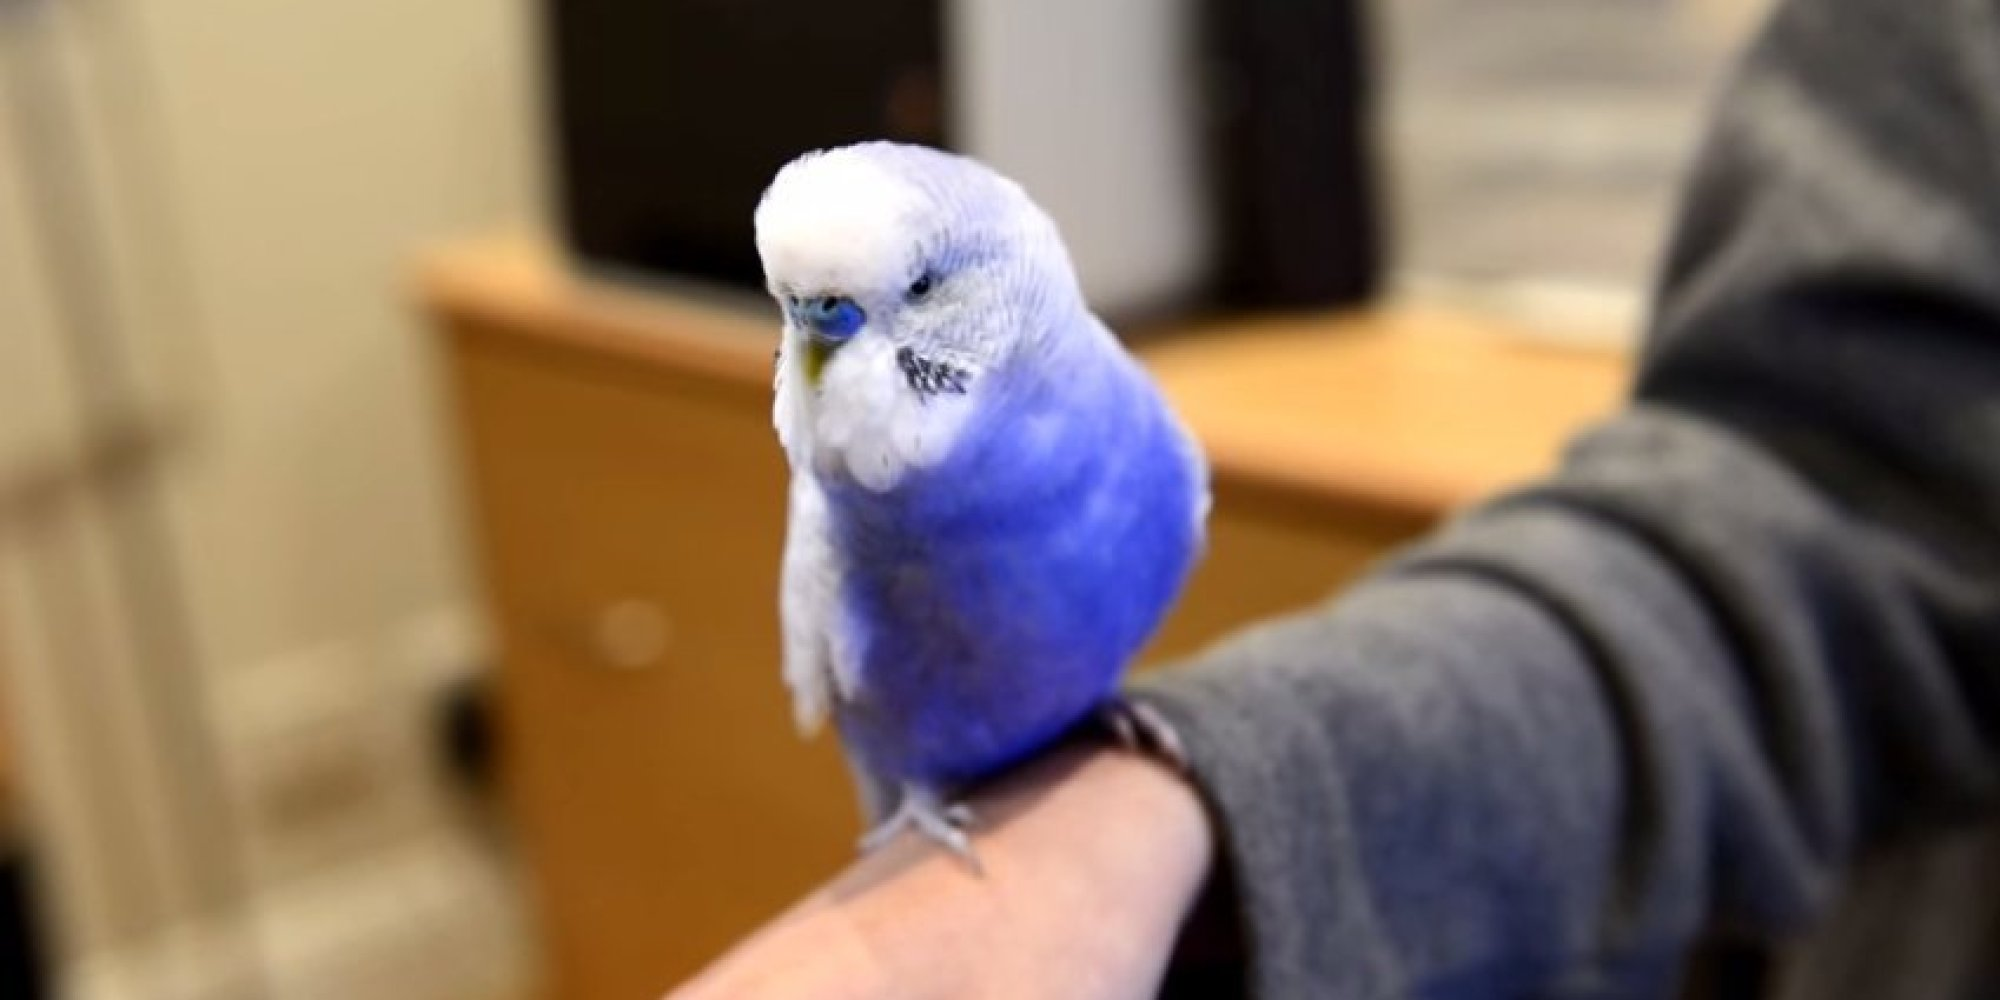 o BLUEY BUDGIE R2D2 facebook